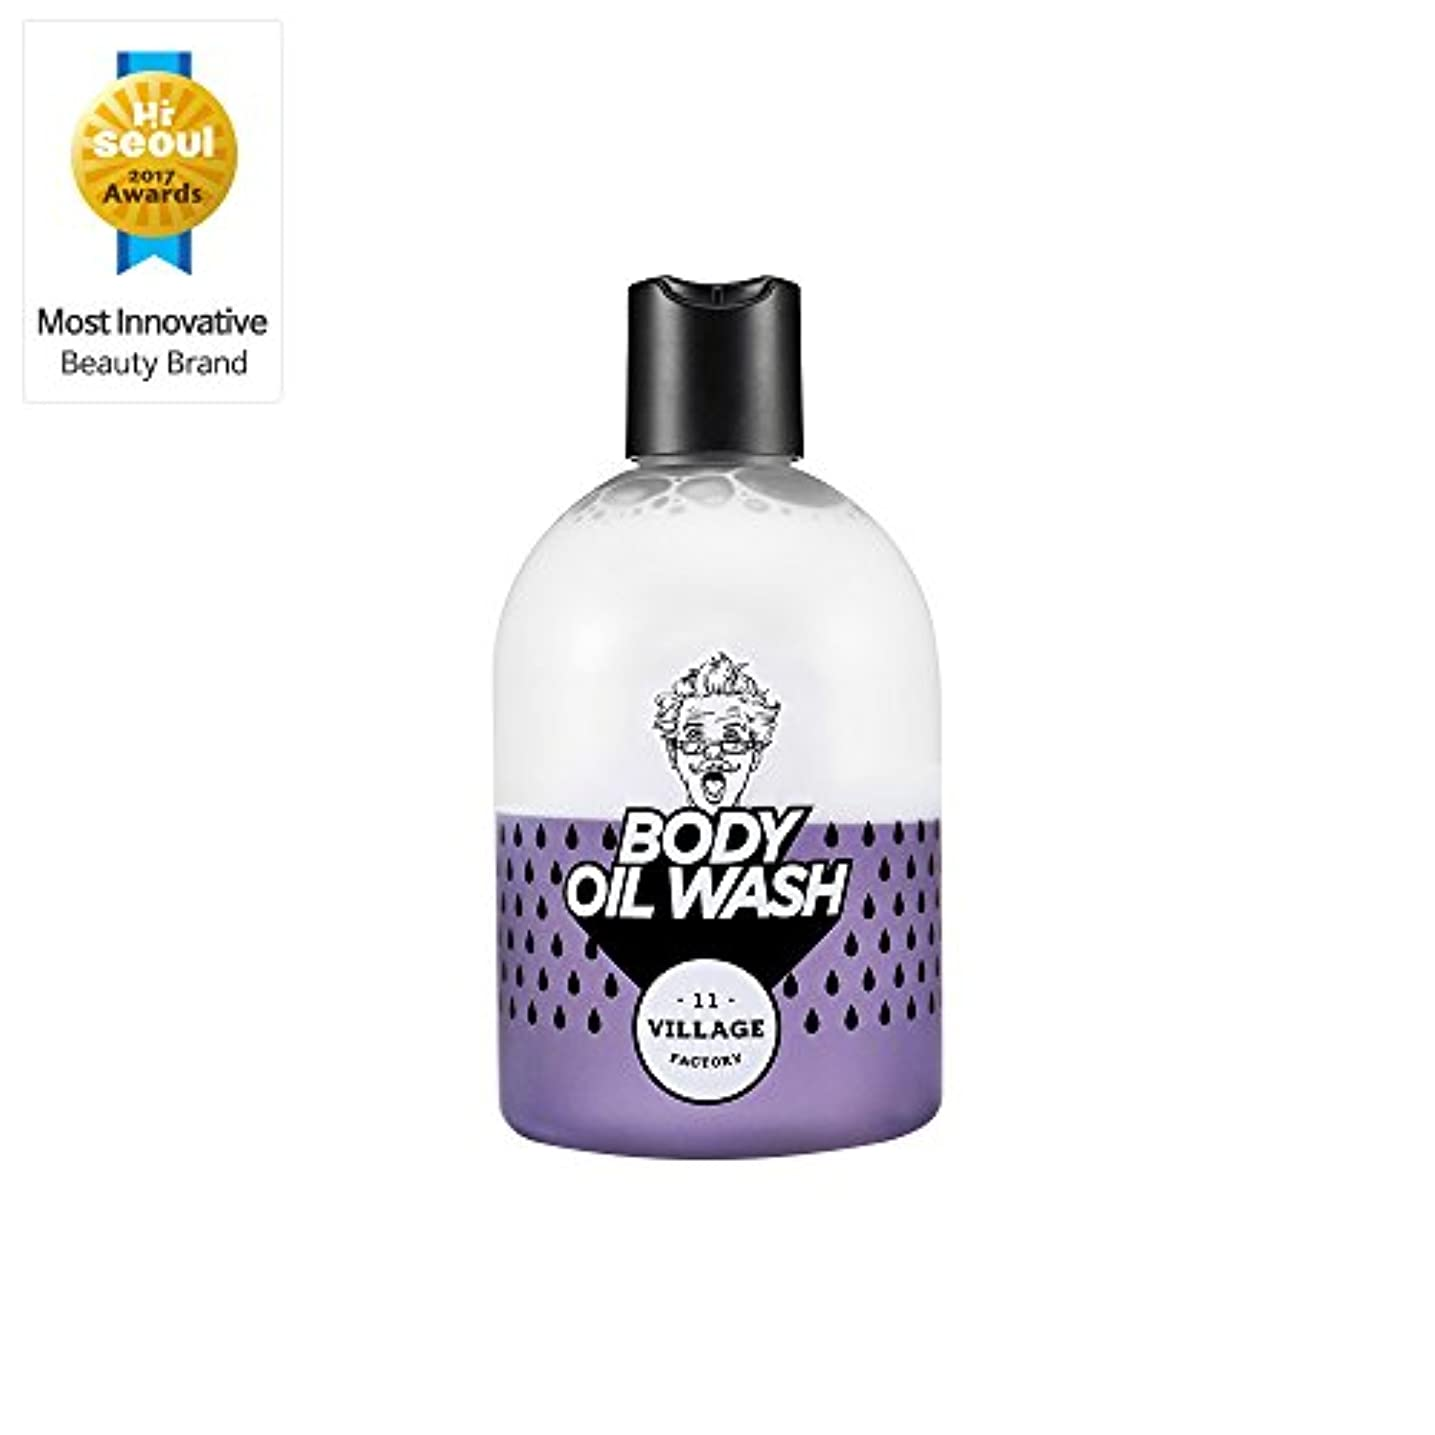 [VILLAGE 11 FACTORY]ビラージュイレブンファクトリー リラクスデー?ボディオイルウォッシュバイオレット(Relax-day Body Oil Wash Violet)